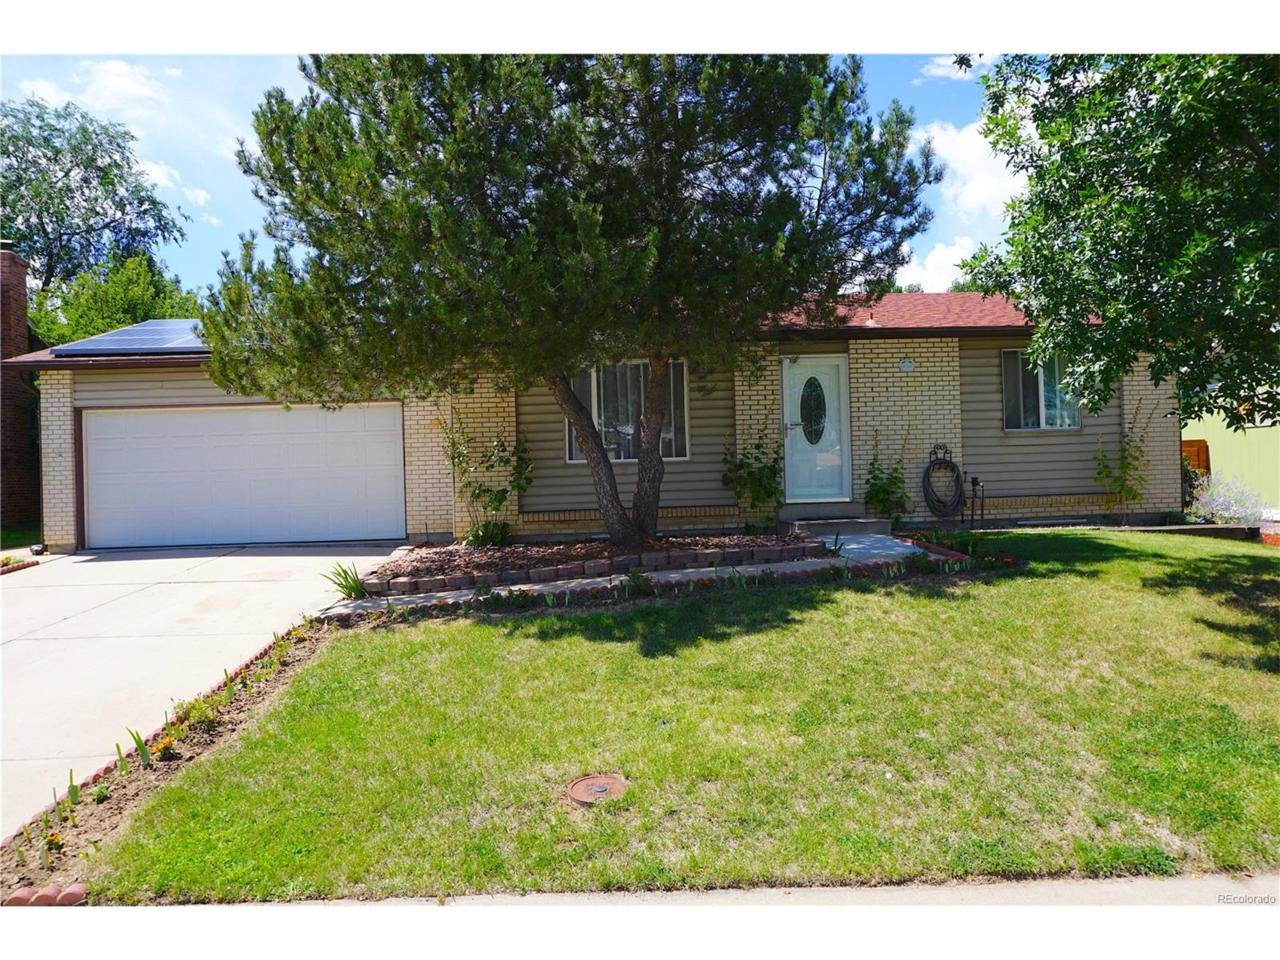 6577 S Estes Street, Littleton, CO 80123 (MLS #7827968) :: 8z Real Estate